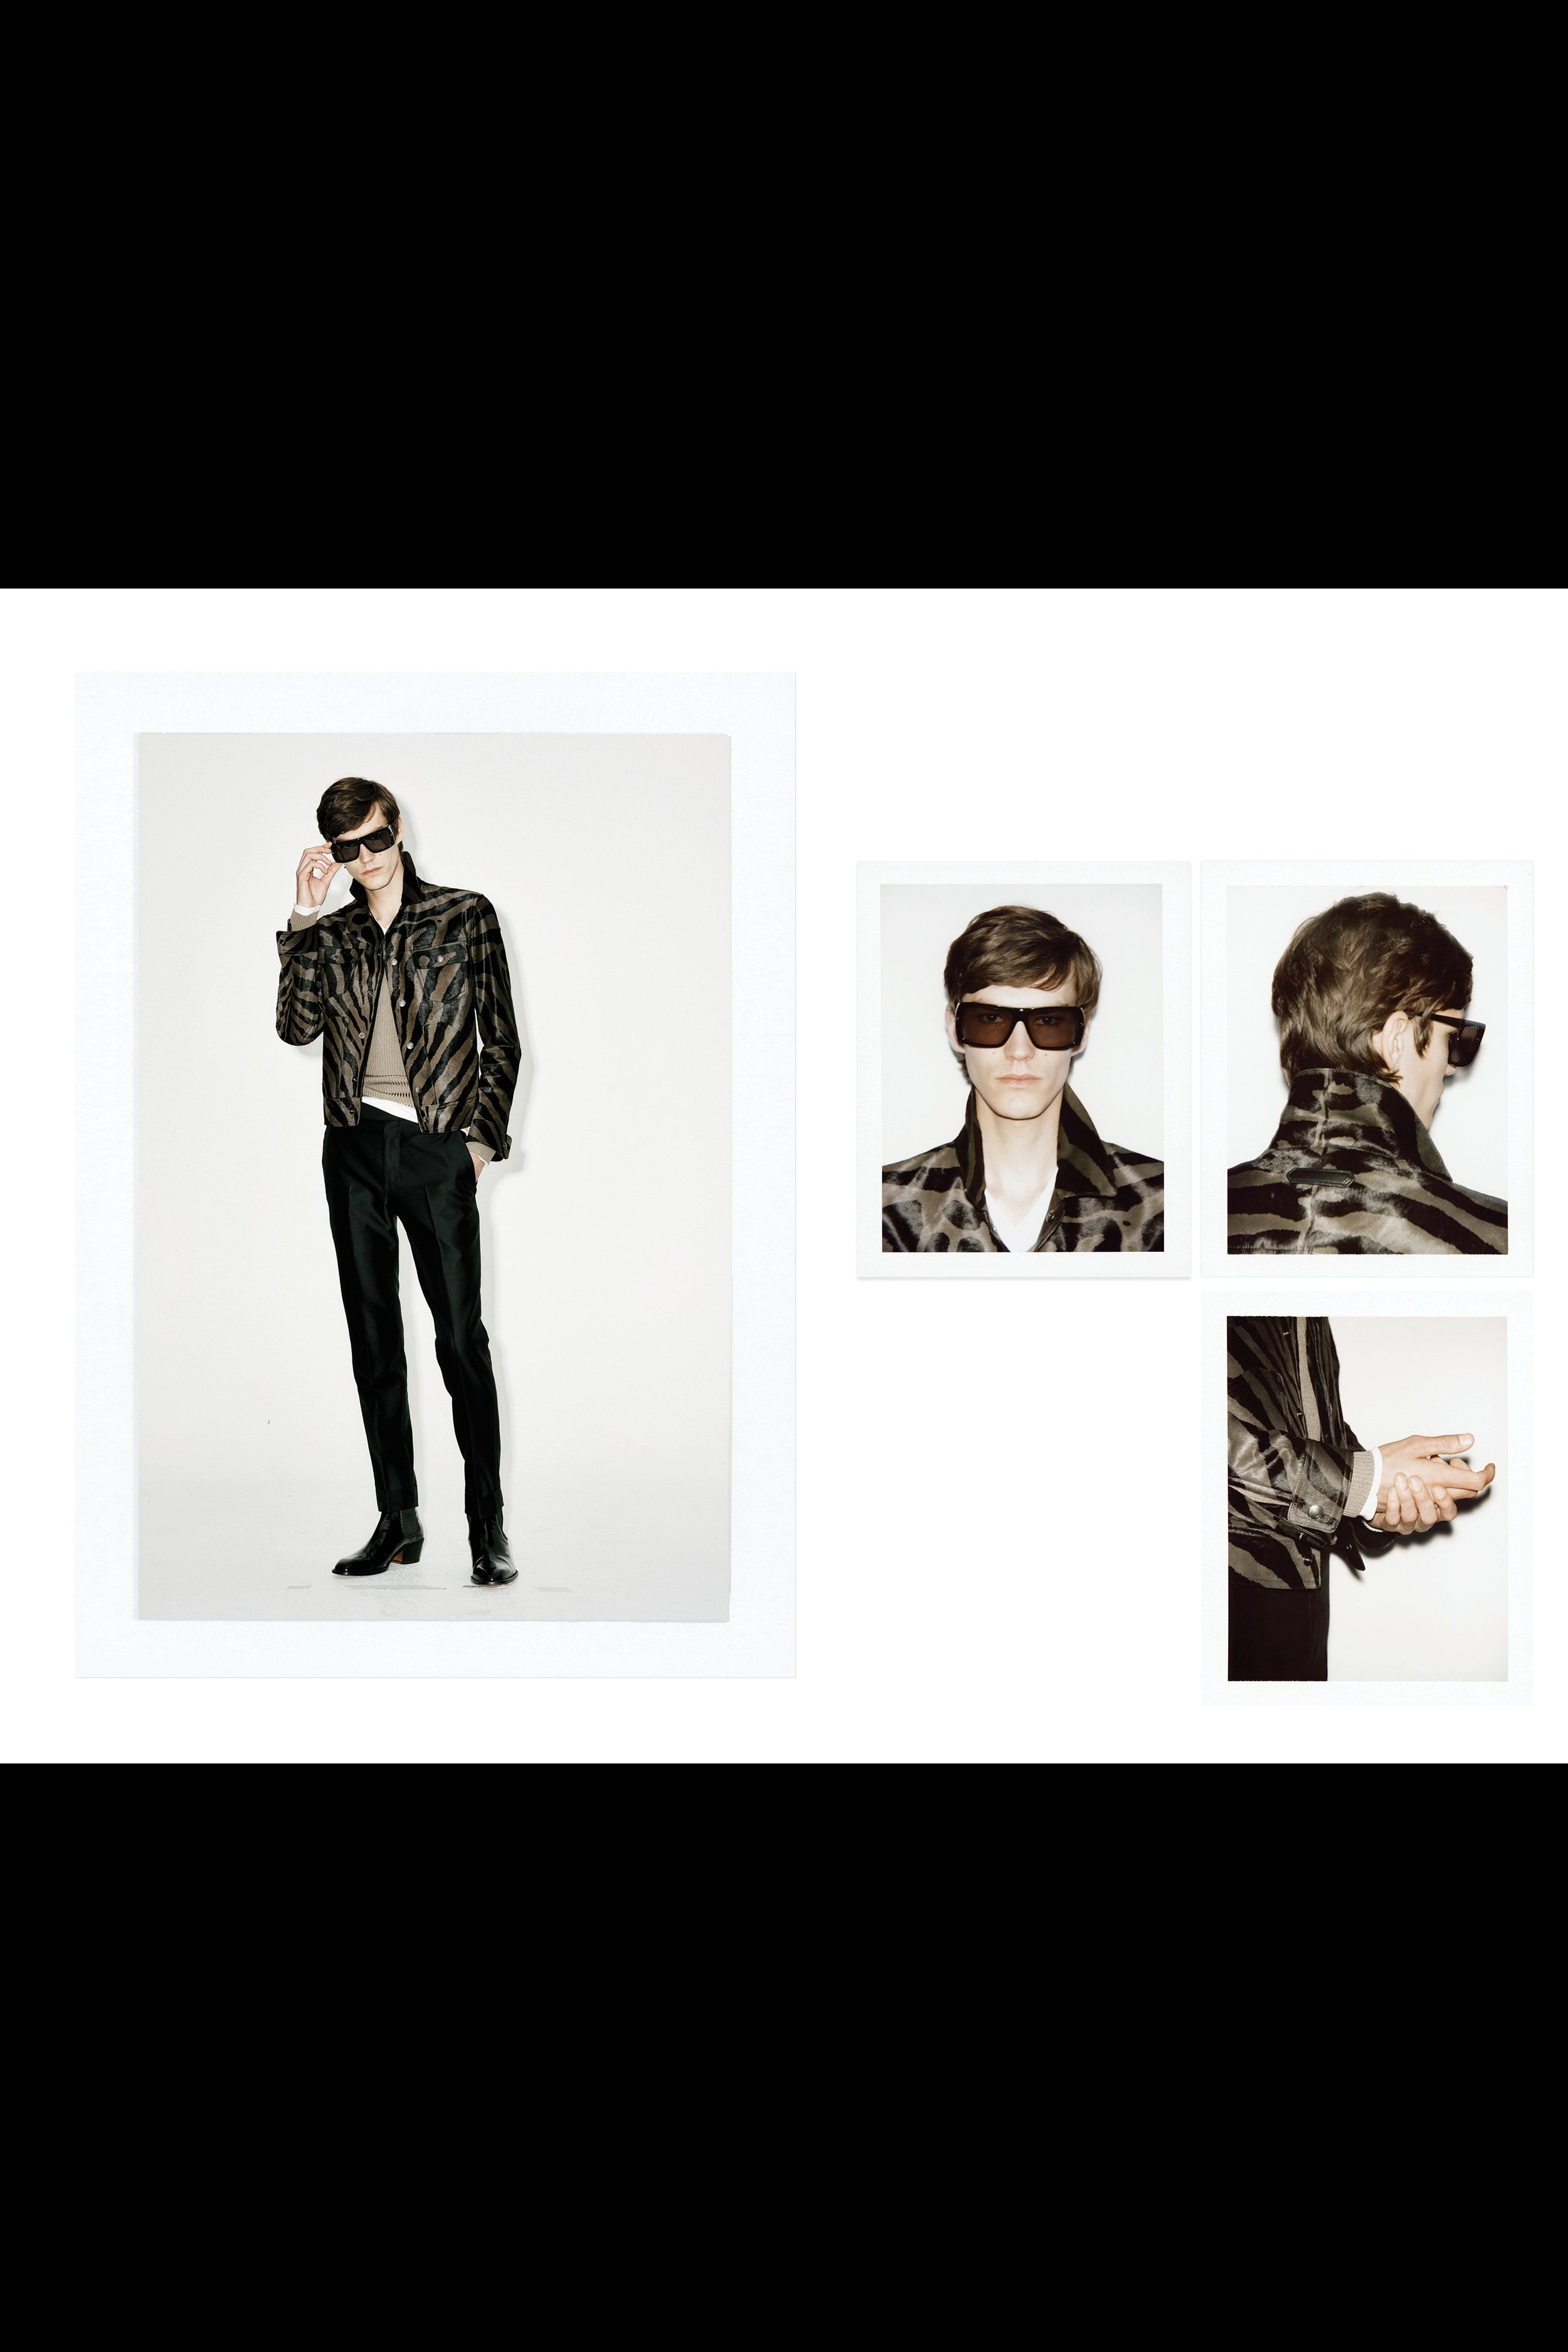 00008-Tom-Ford-vogue-menswear-spring-2019-pr.jpg